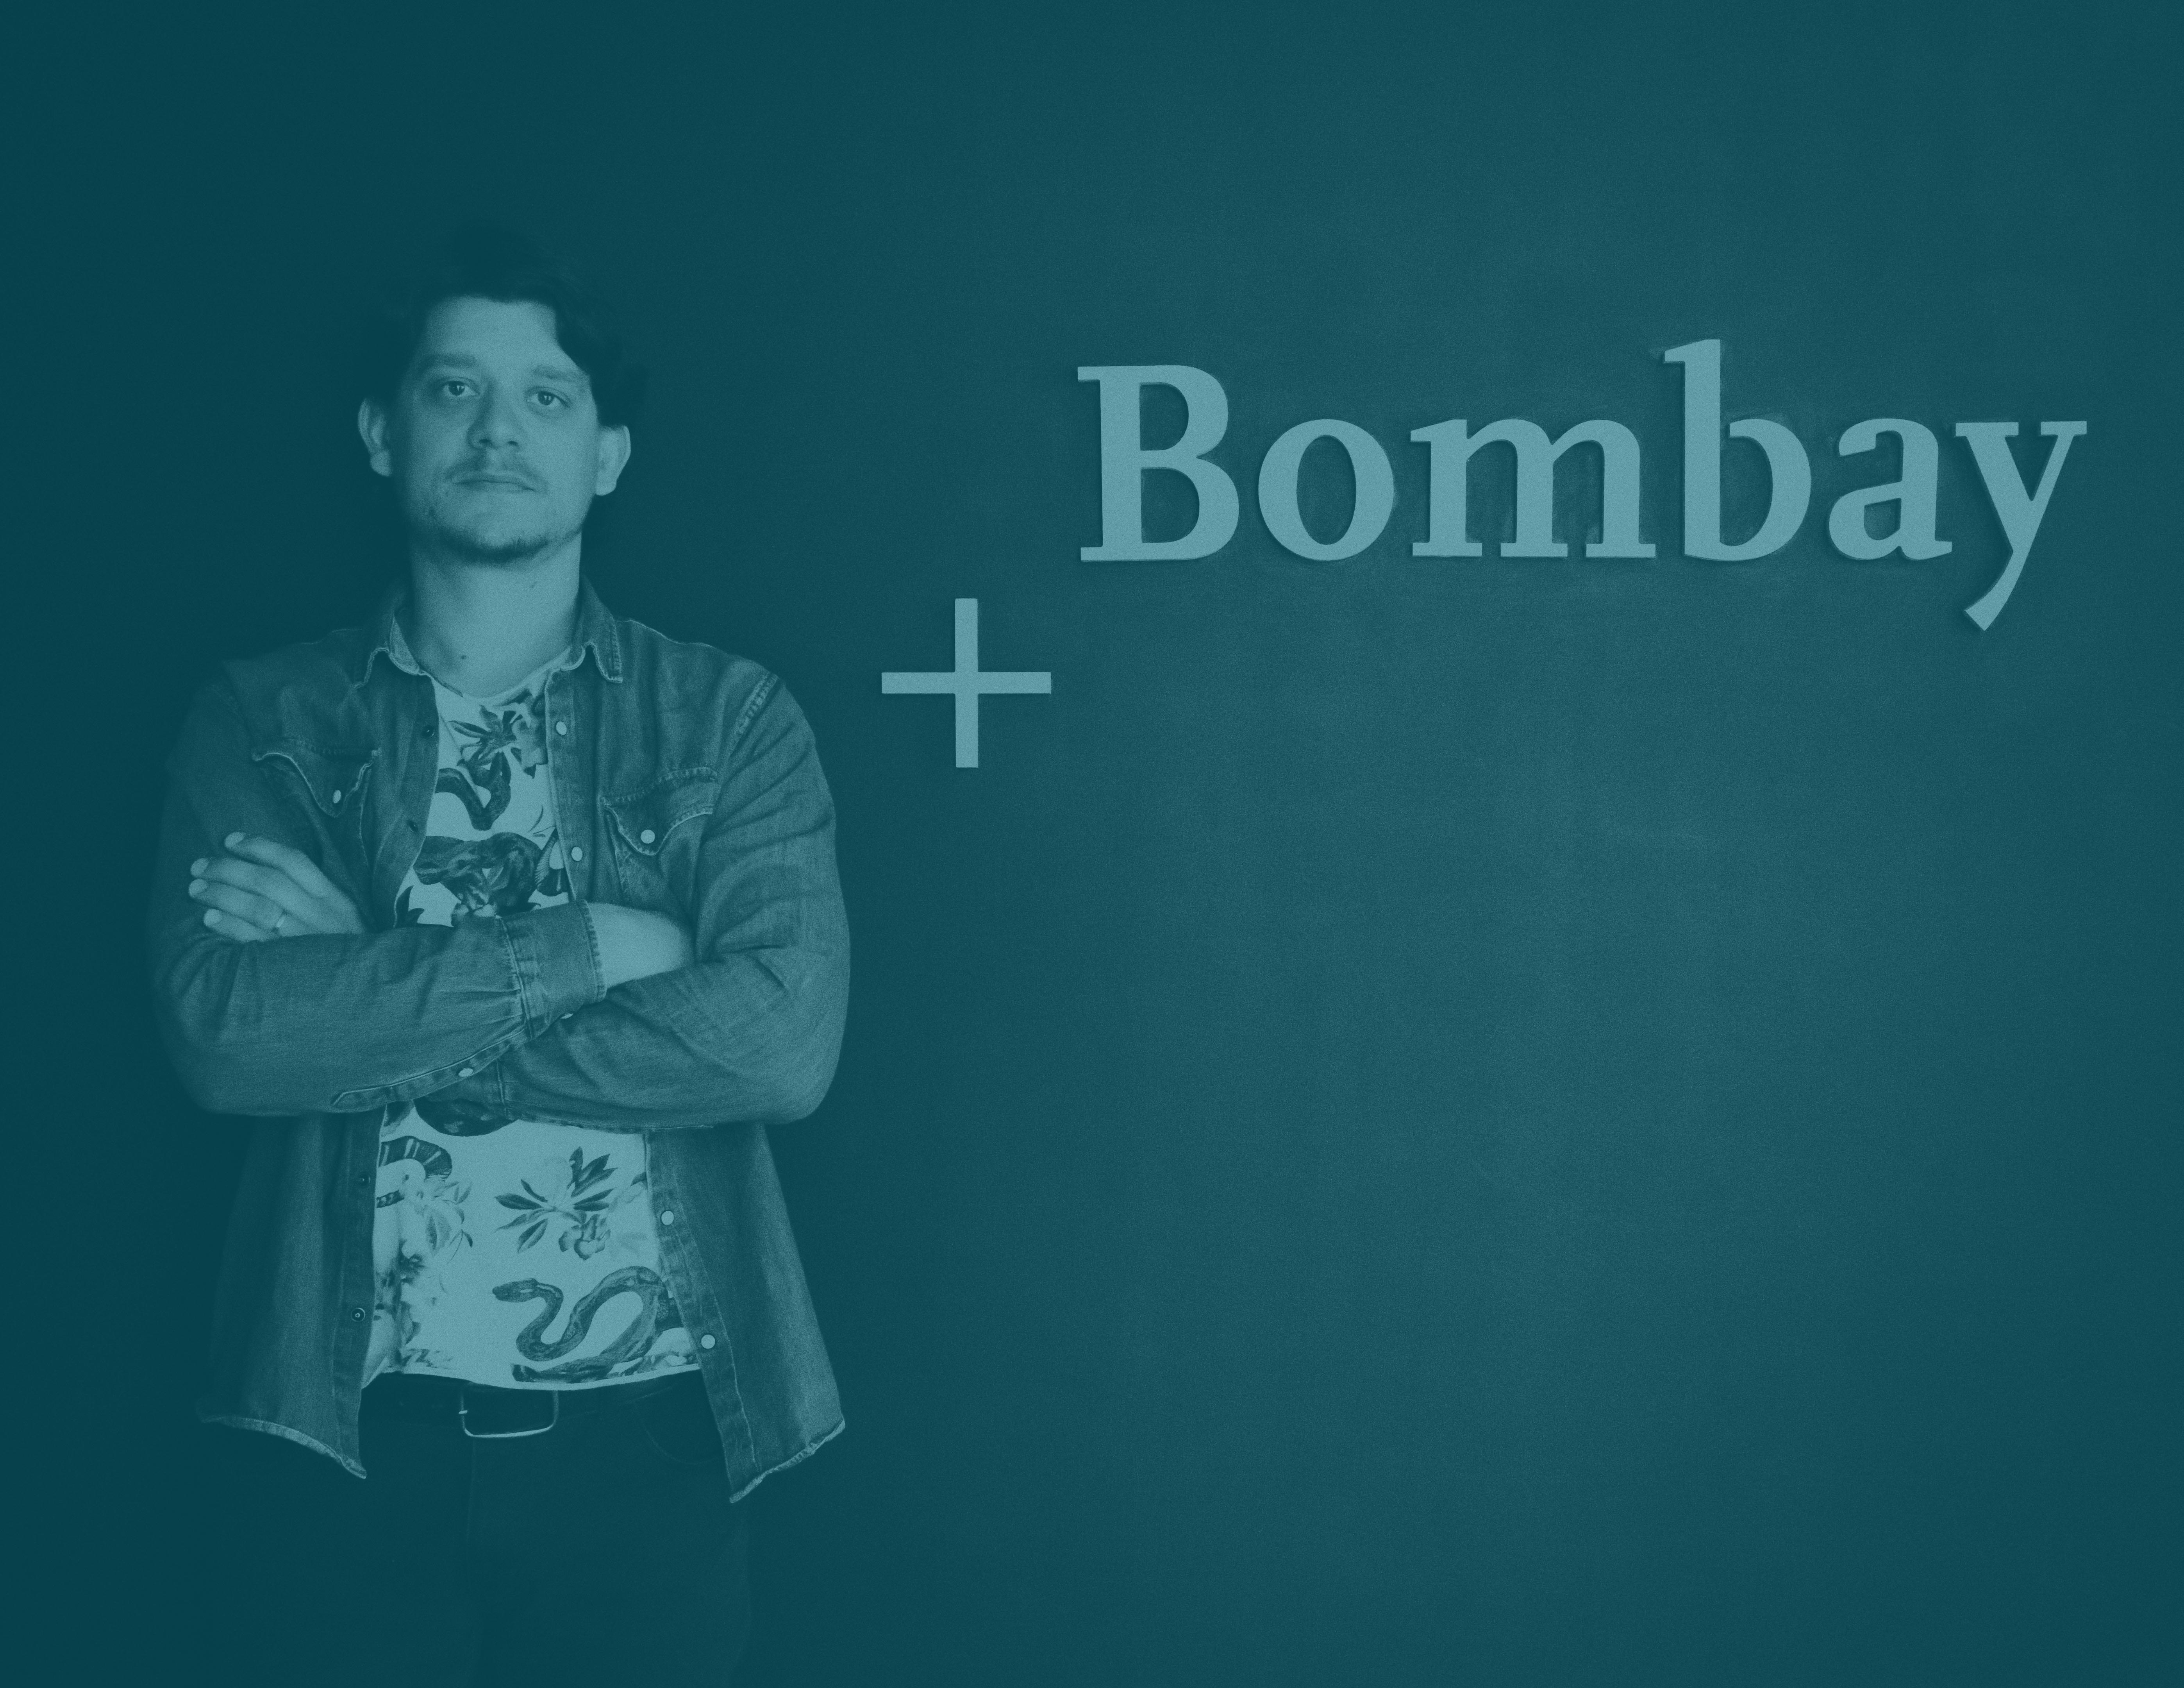 Bombay llega a Argentina 4